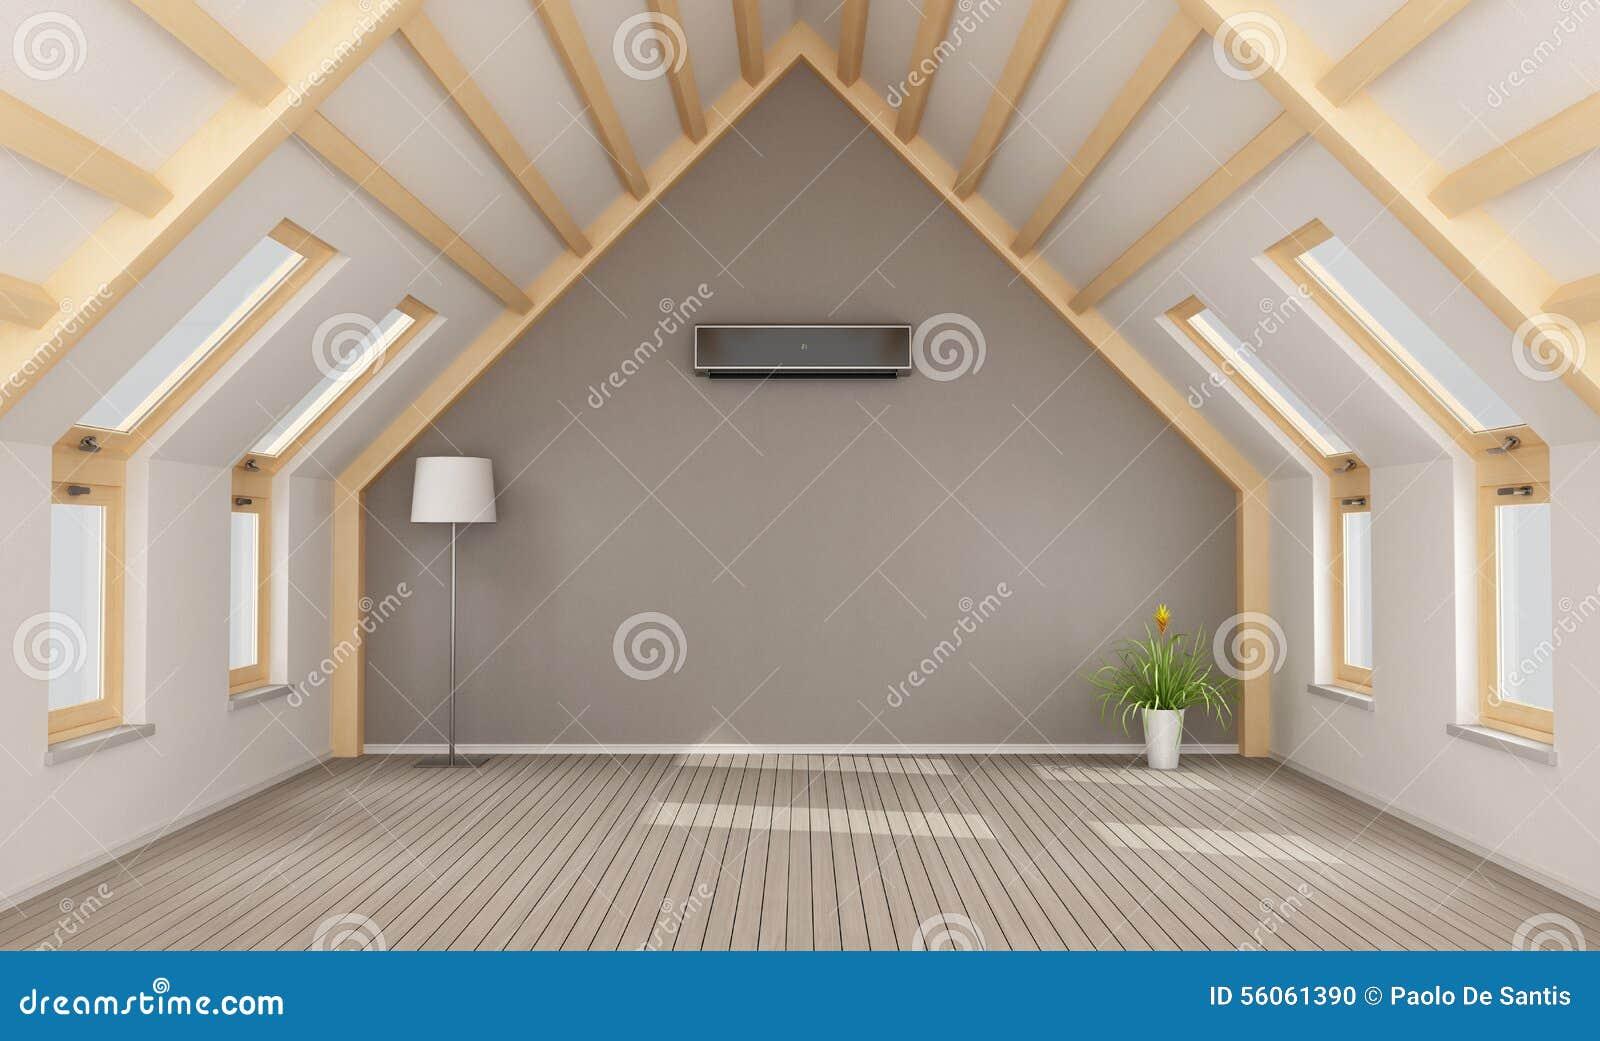 moderner dachboden ohne m bel stock abbildung bild 56061390. Black Bedroom Furniture Sets. Home Design Ideas